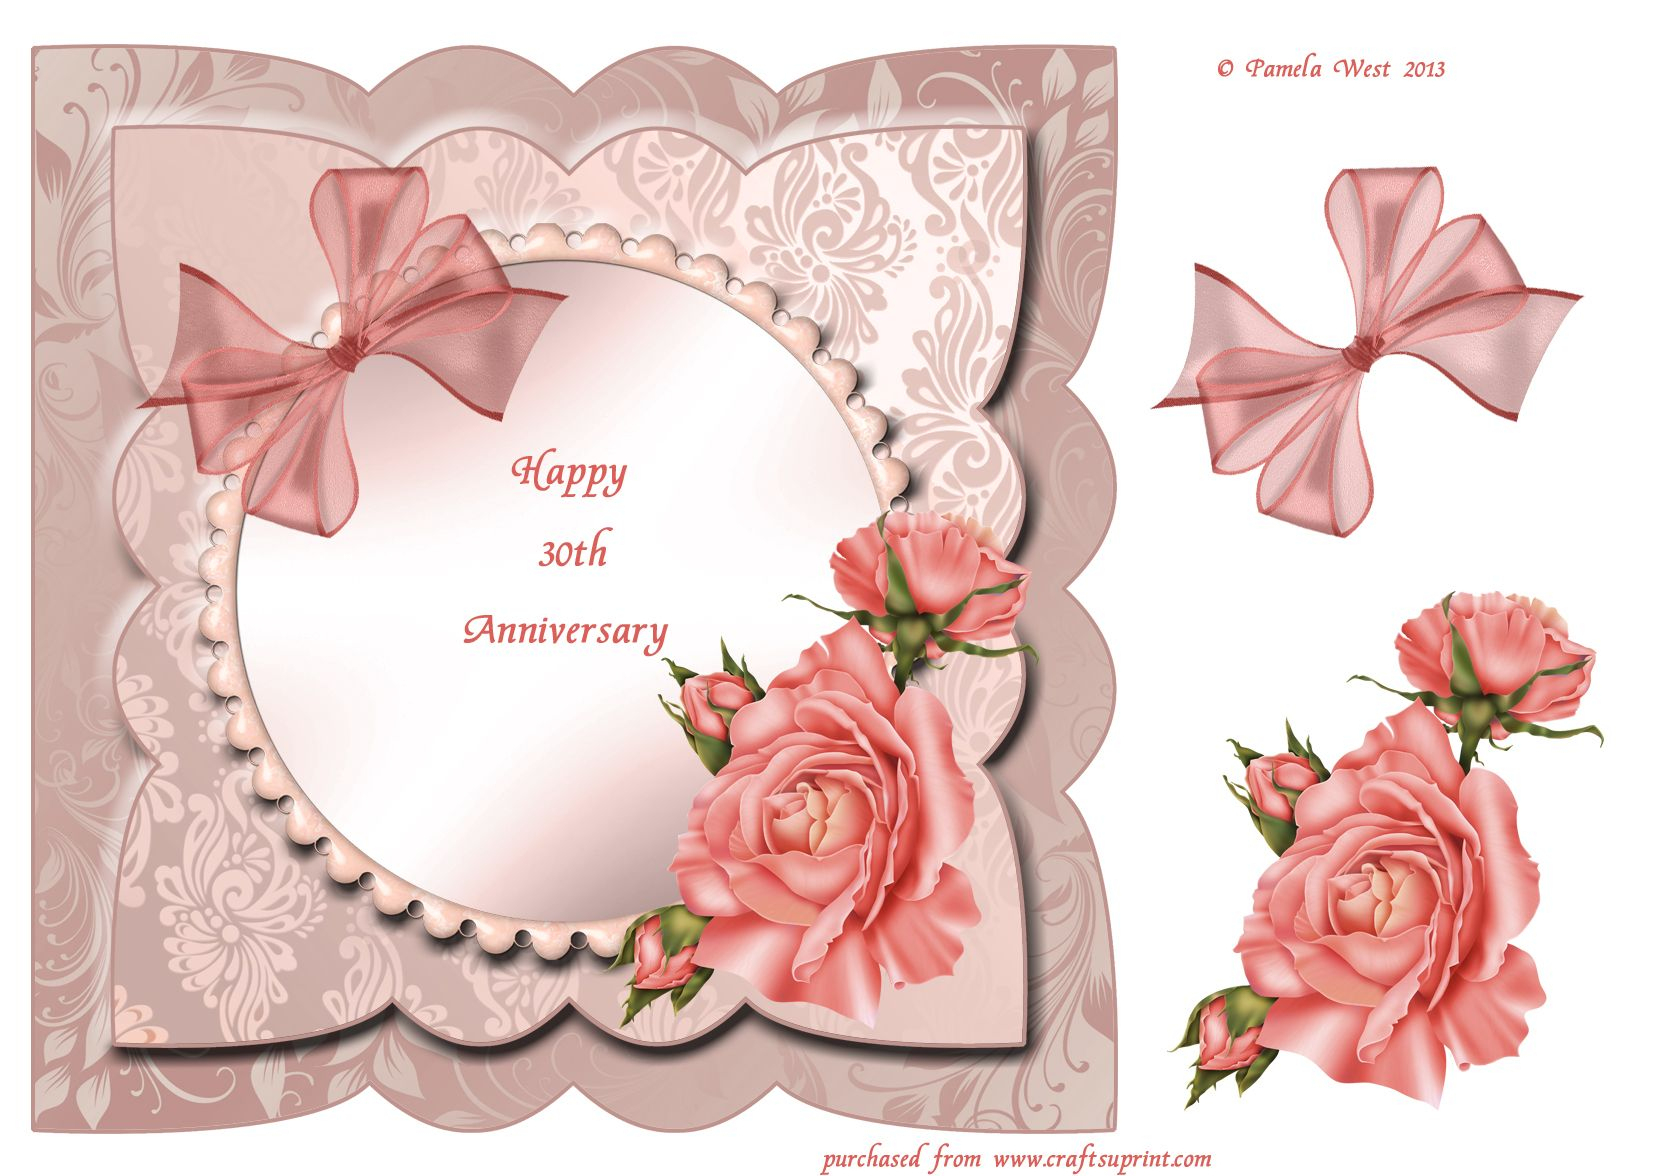 Pinbyn.arda Arda On Dekupaj   Decoupage, Cards, Wedding - Free Printable Decoupage Images